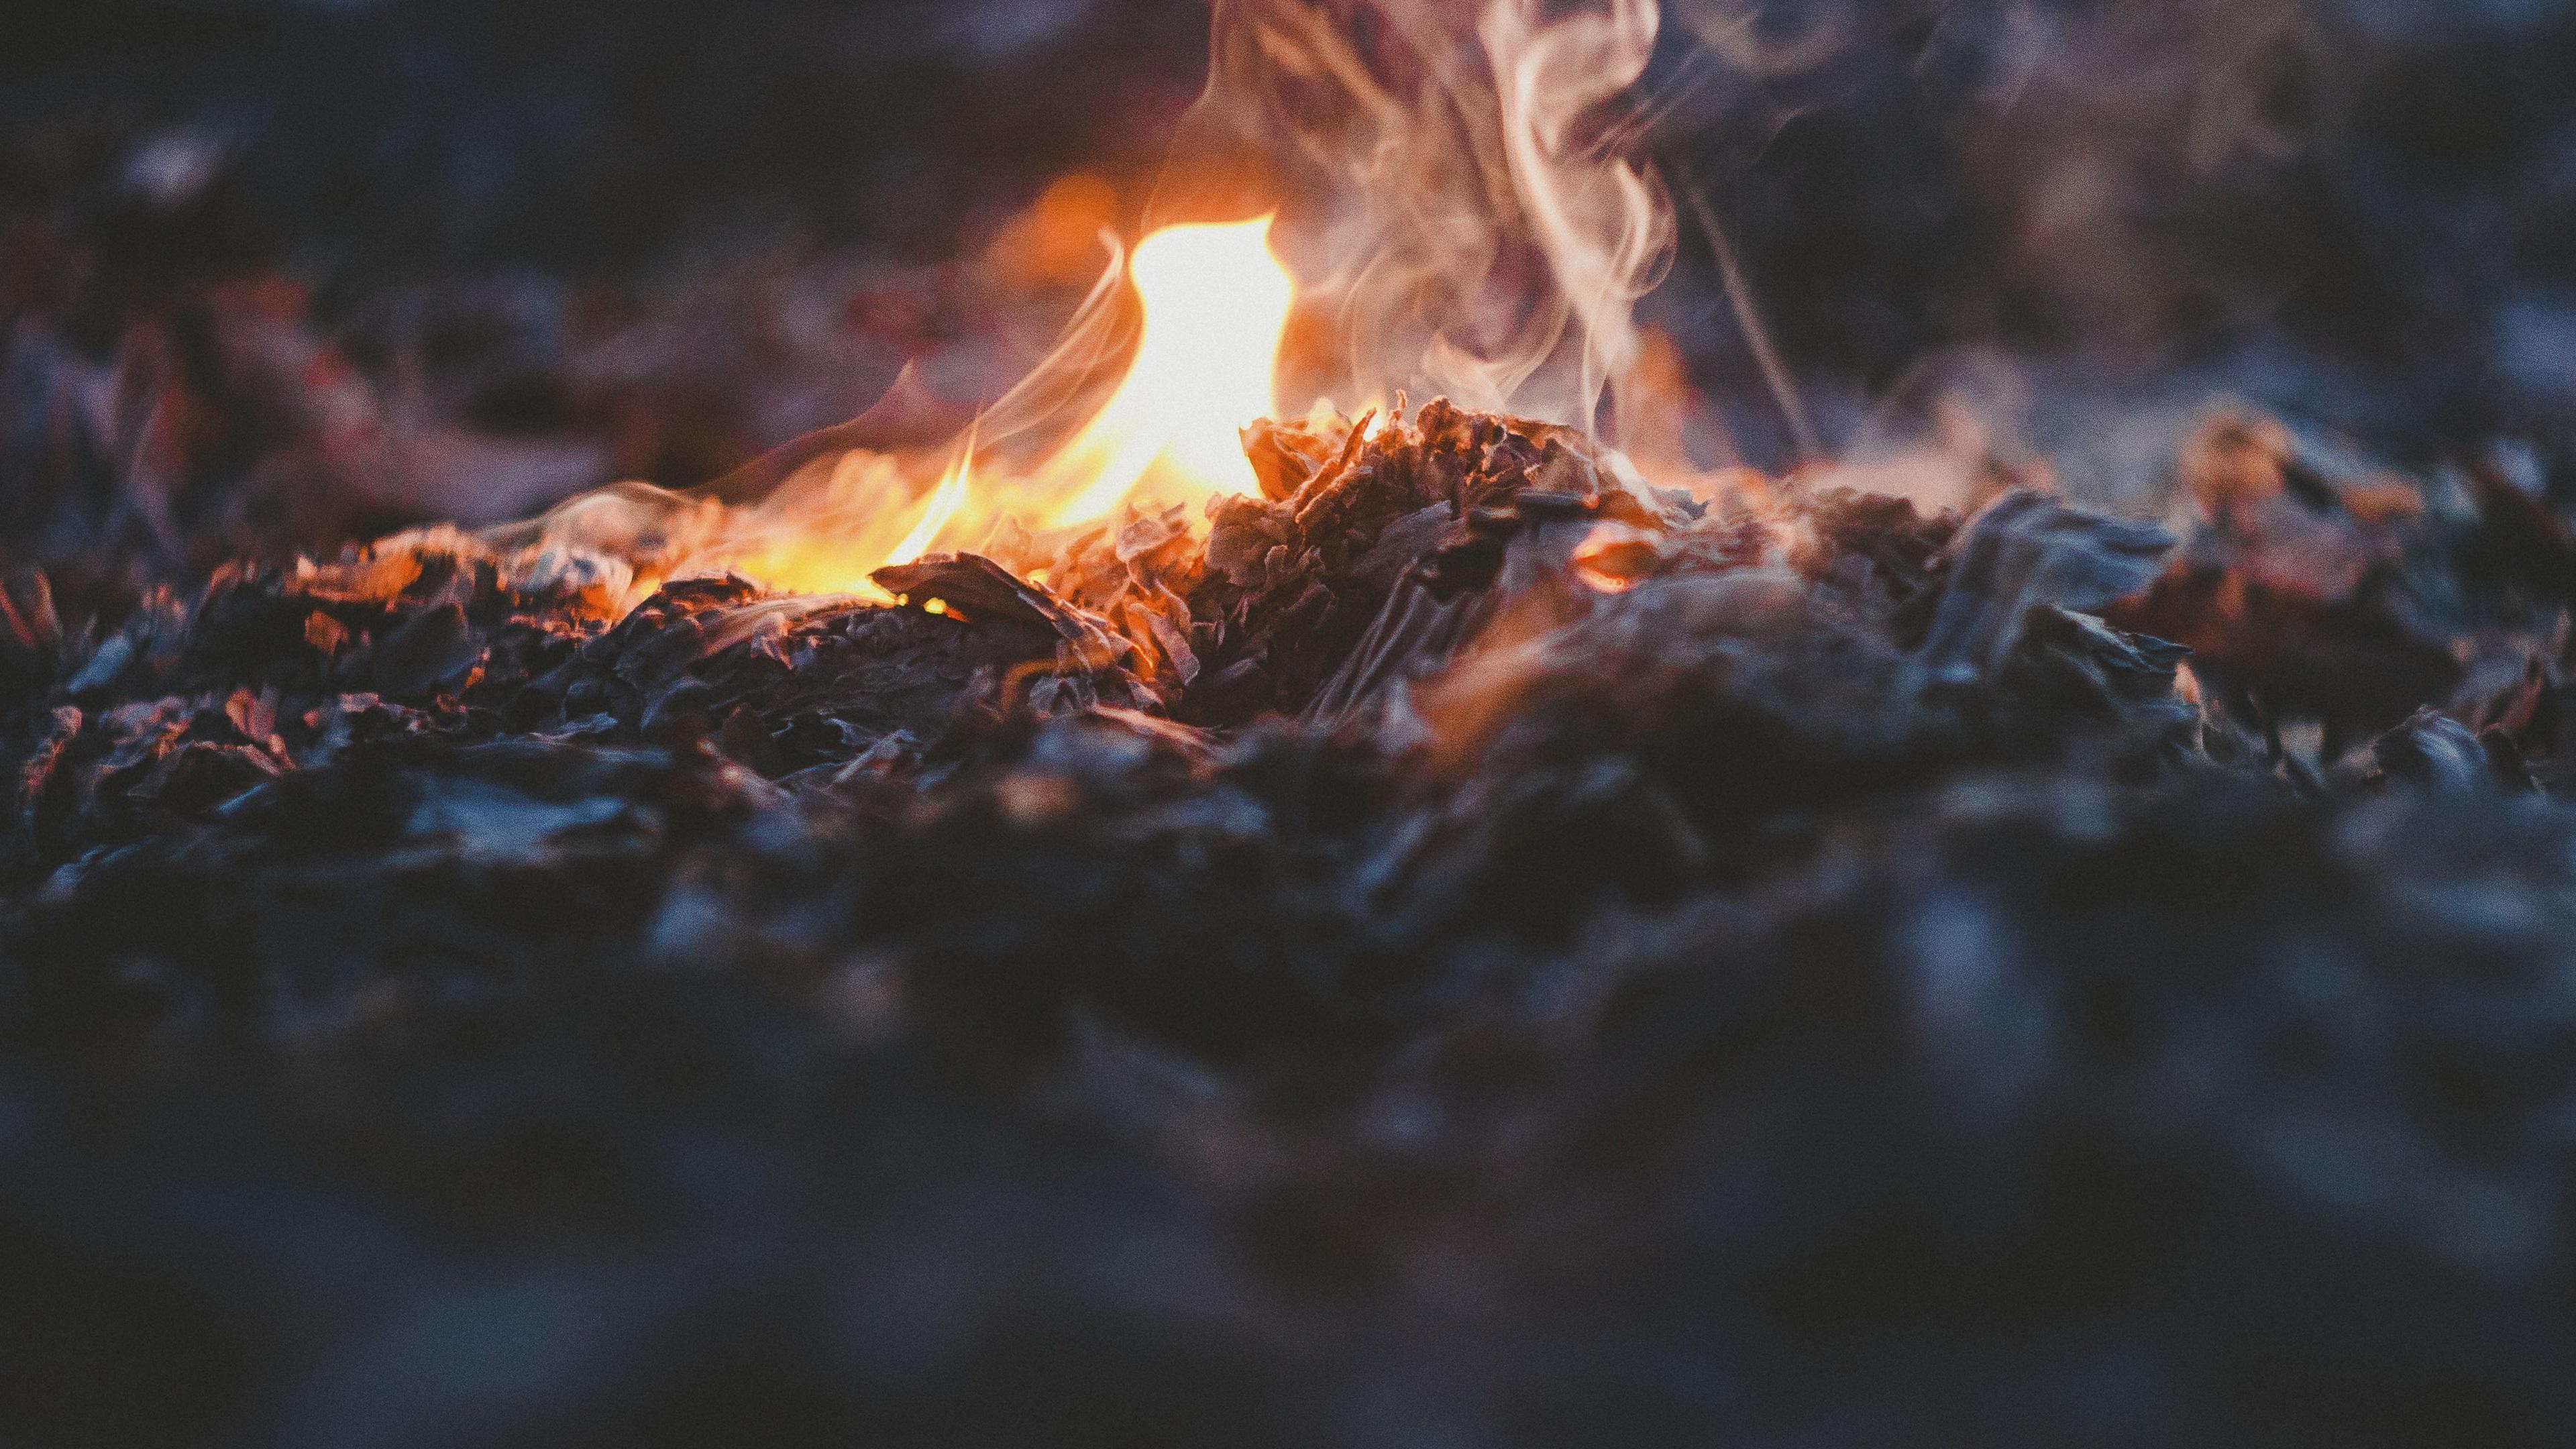 Wallpaper Fire Bonfire 3840x2160 Uhd 4k Picture Image